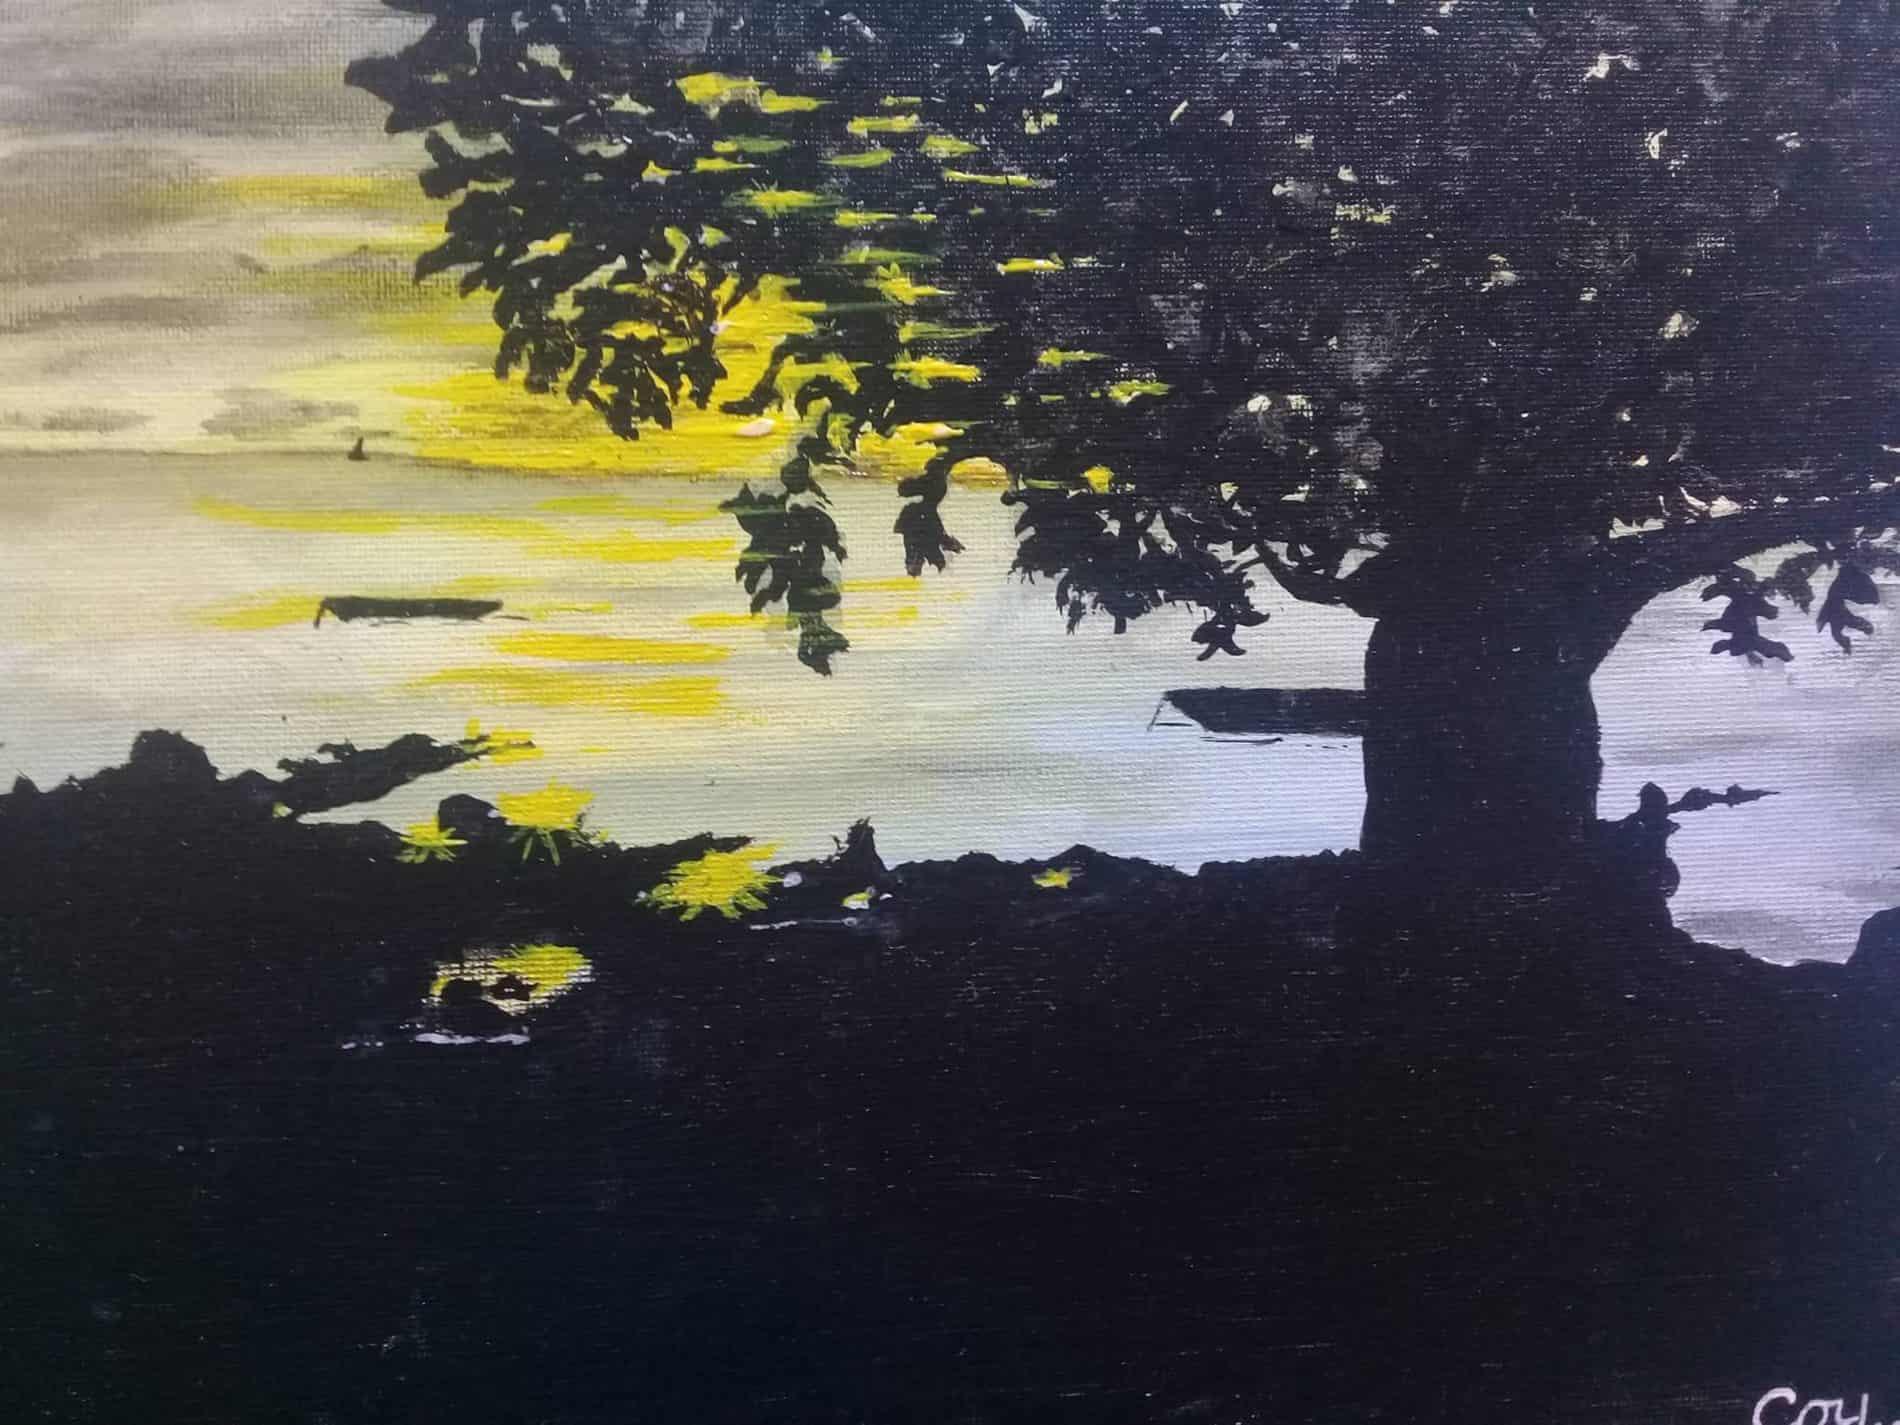 mauritian-artist-corinne-felicite-baie-du-cap-shadow